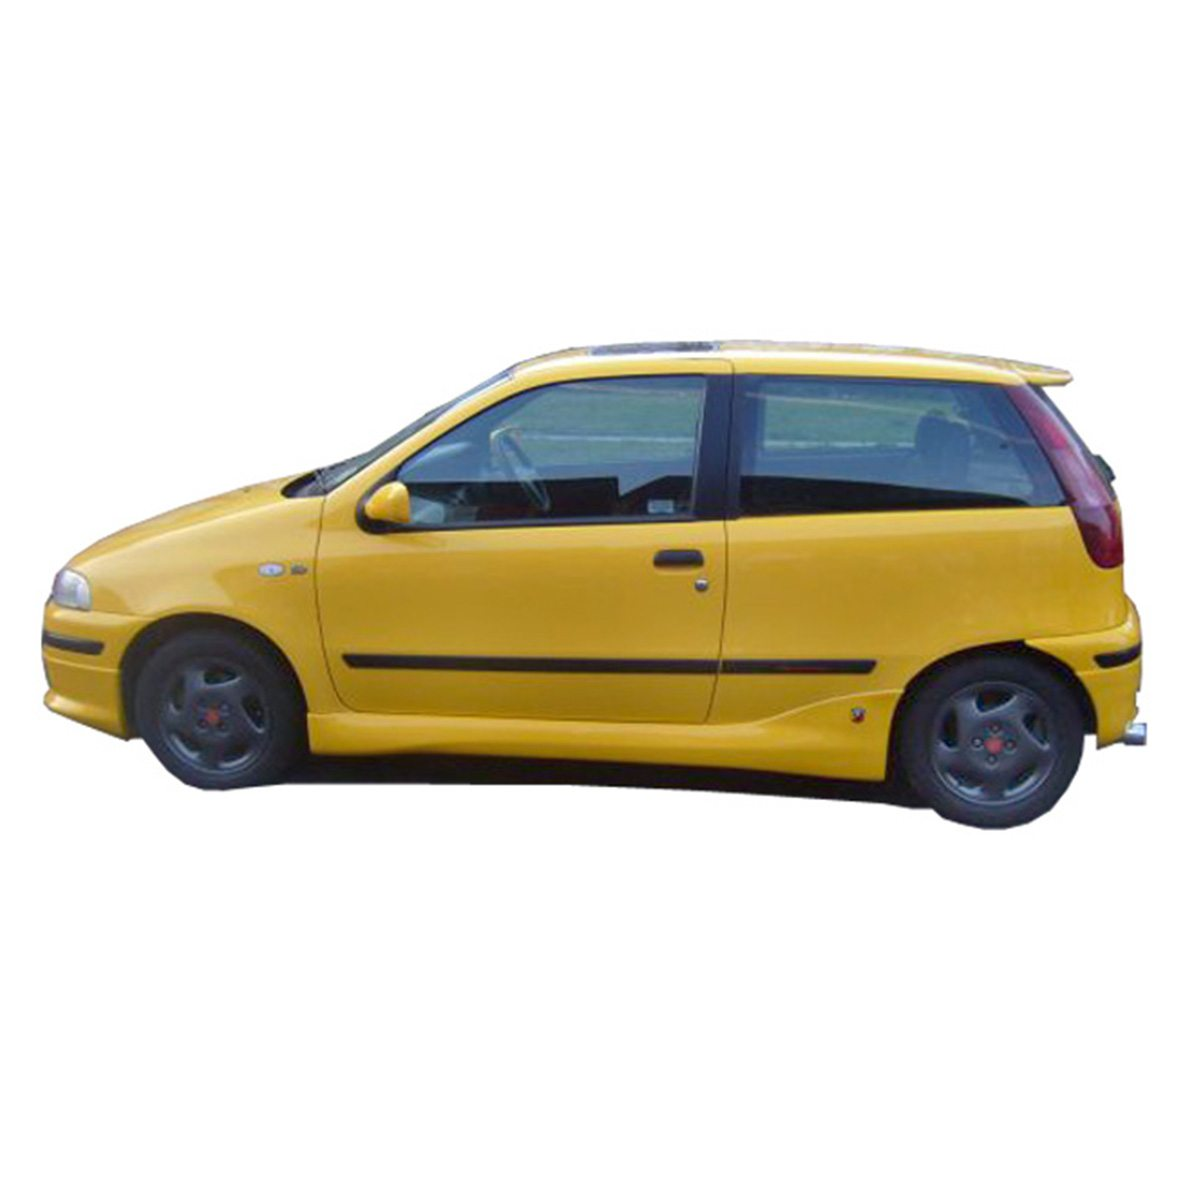 Fiat Punto (93-99) – Embaladeiras Abarth